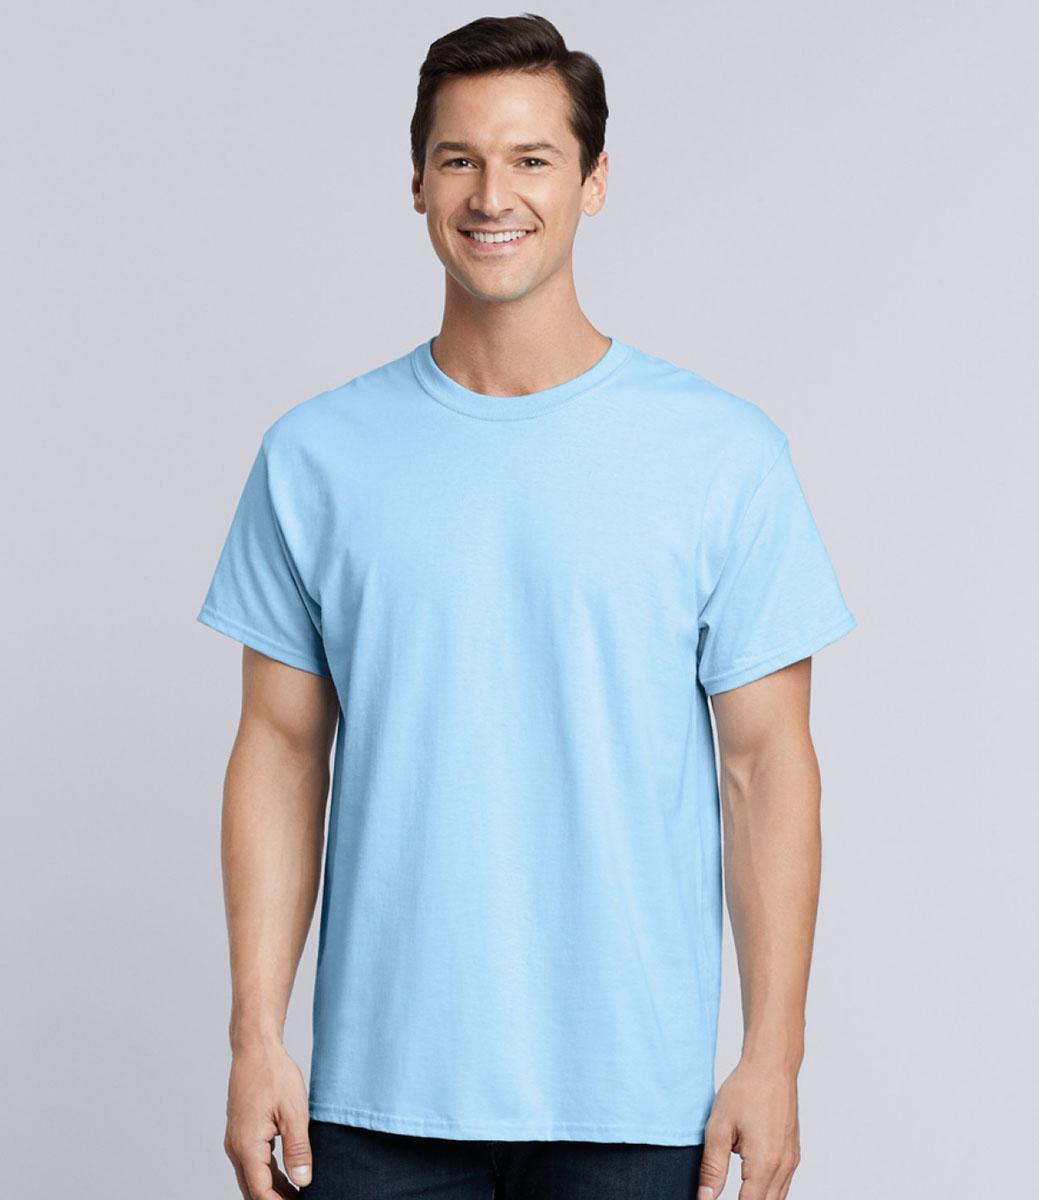 Gildan Mens Seamless Double Needle T-Shirt Blue Dusk